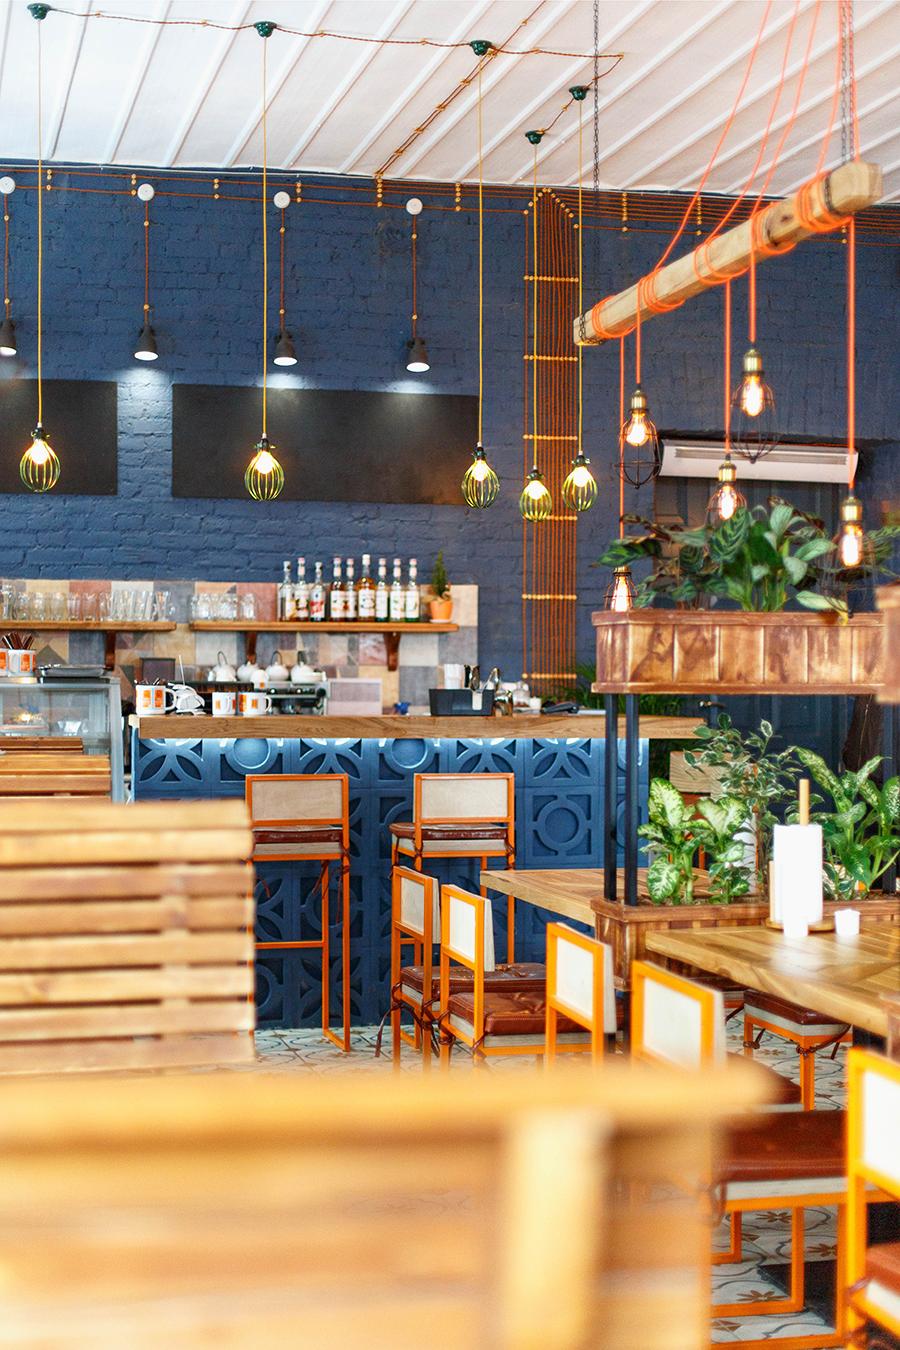 Karl Marks burgers interior